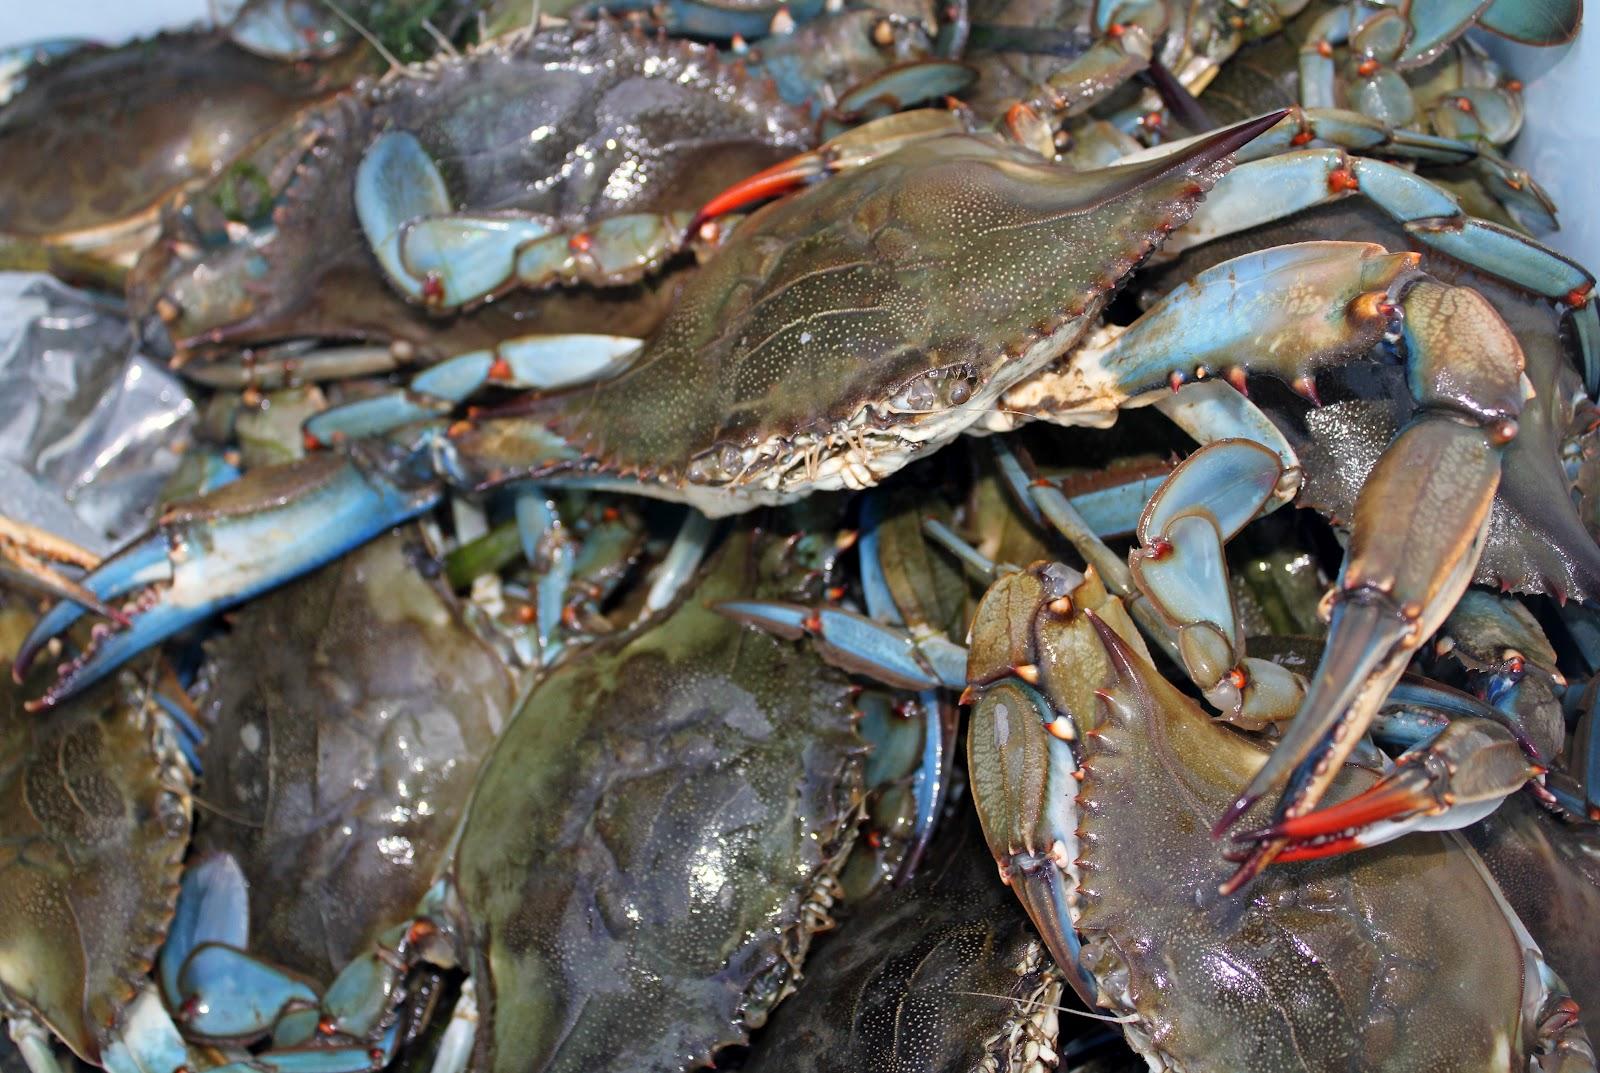 Blue crabs caught in the Connecticut RiverPhoto: Kierran Broatch